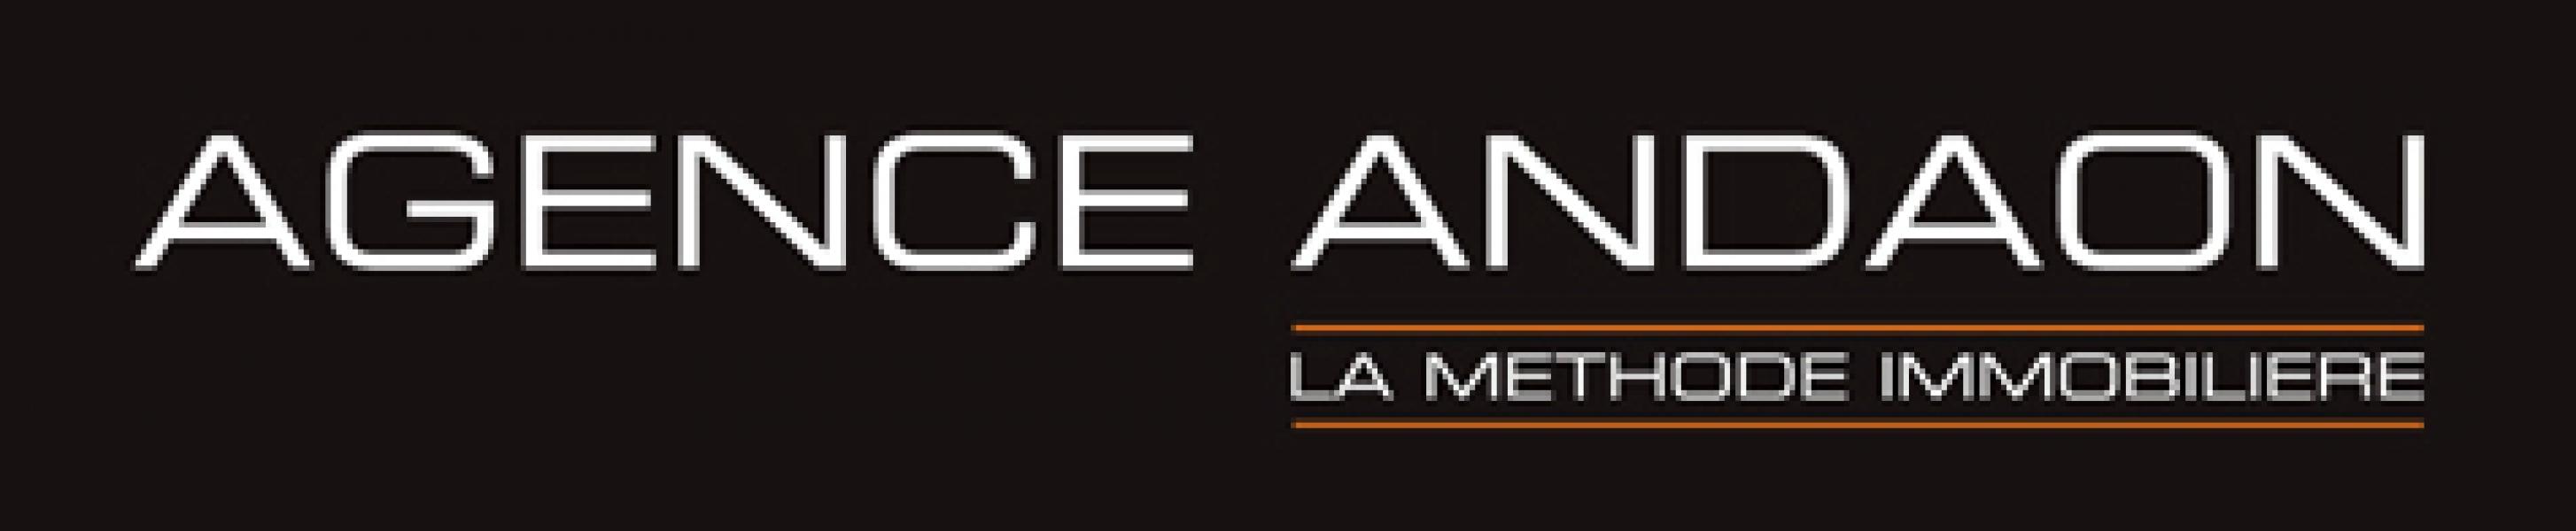 Andaon Immobilier Groupe Pradier agence immobilière Avignon (84000)